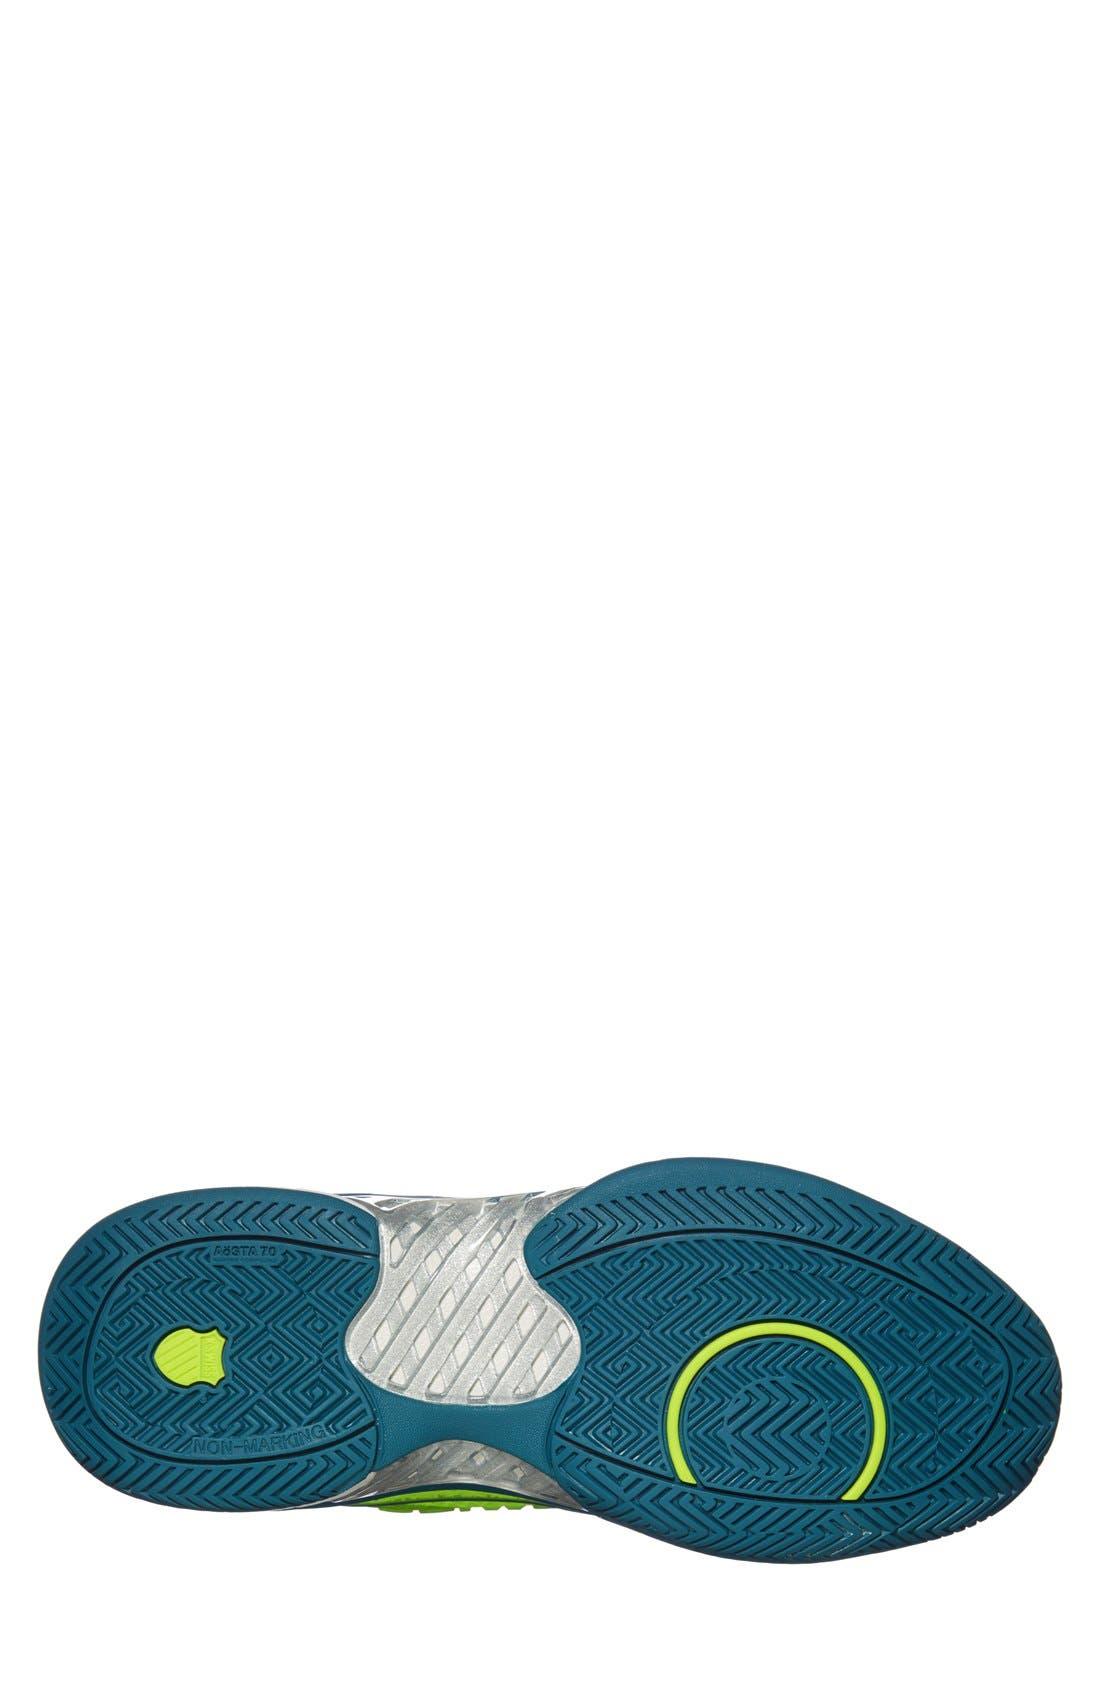 Alternate Image 4  - K-Swiss 'Ultra Express' Tennis Shoe (Men)